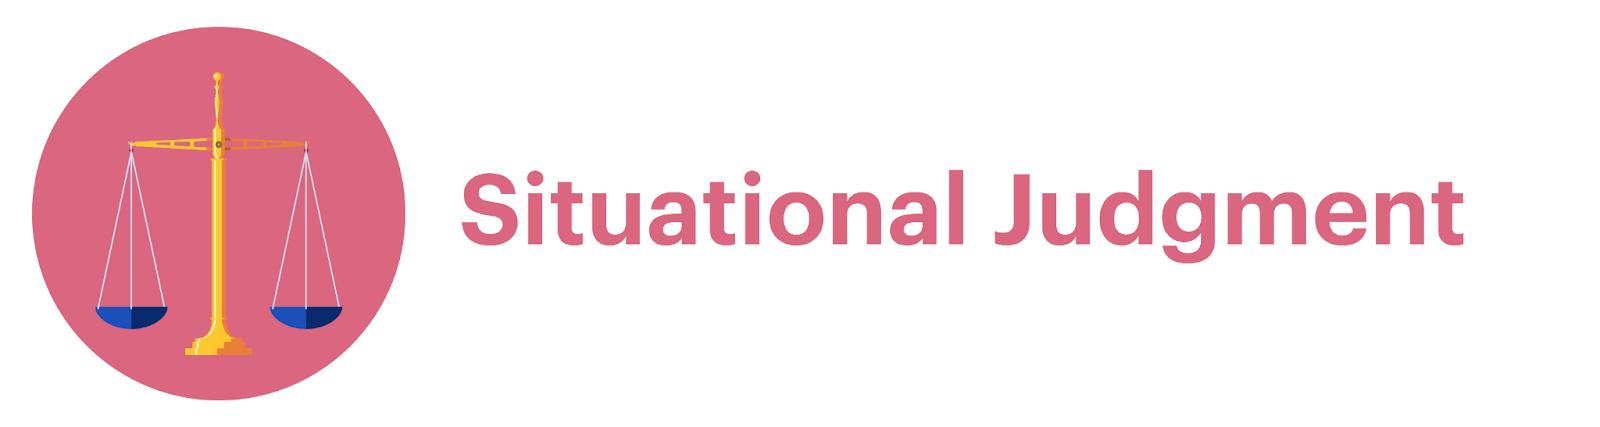 UCAT Situational Judgement (SJT) icon